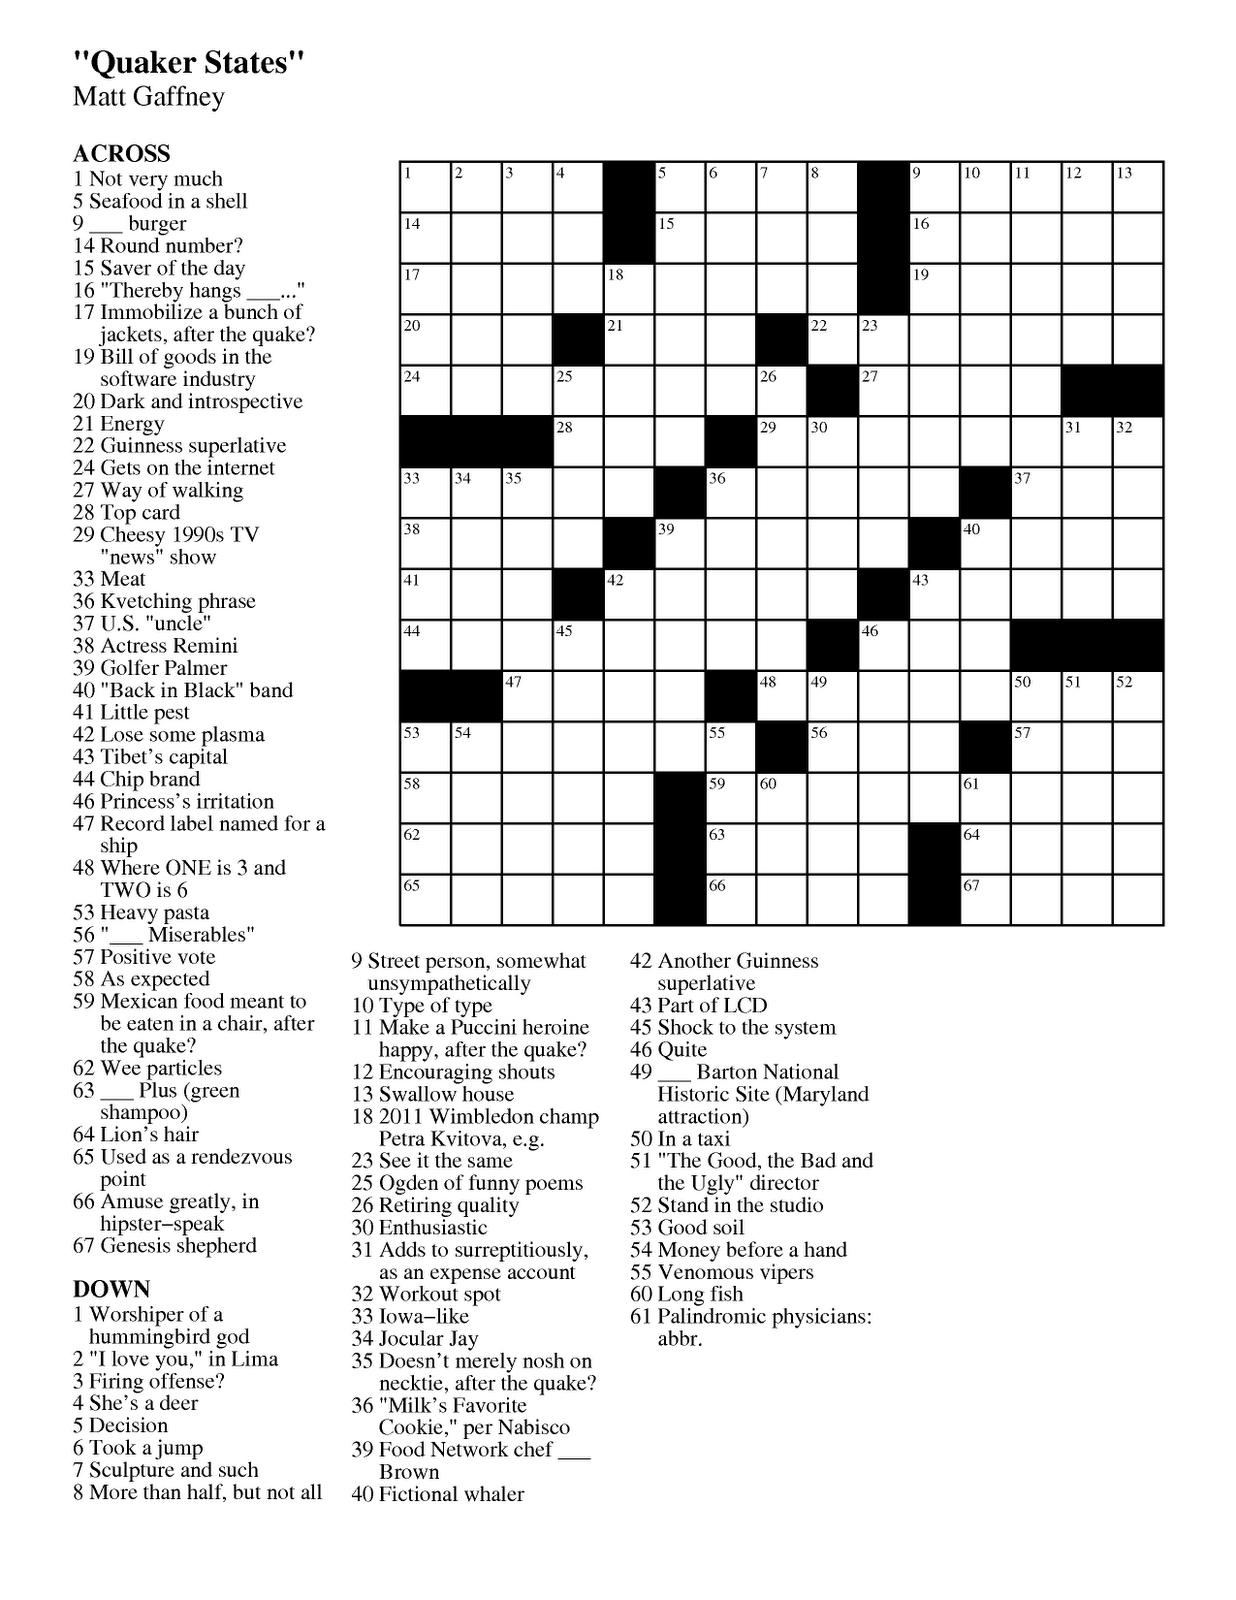 Summer Crossword Puzzle Worksheet - Free Esl Printable Worksheets - Free Printable Crossword Puzzles For Middle School